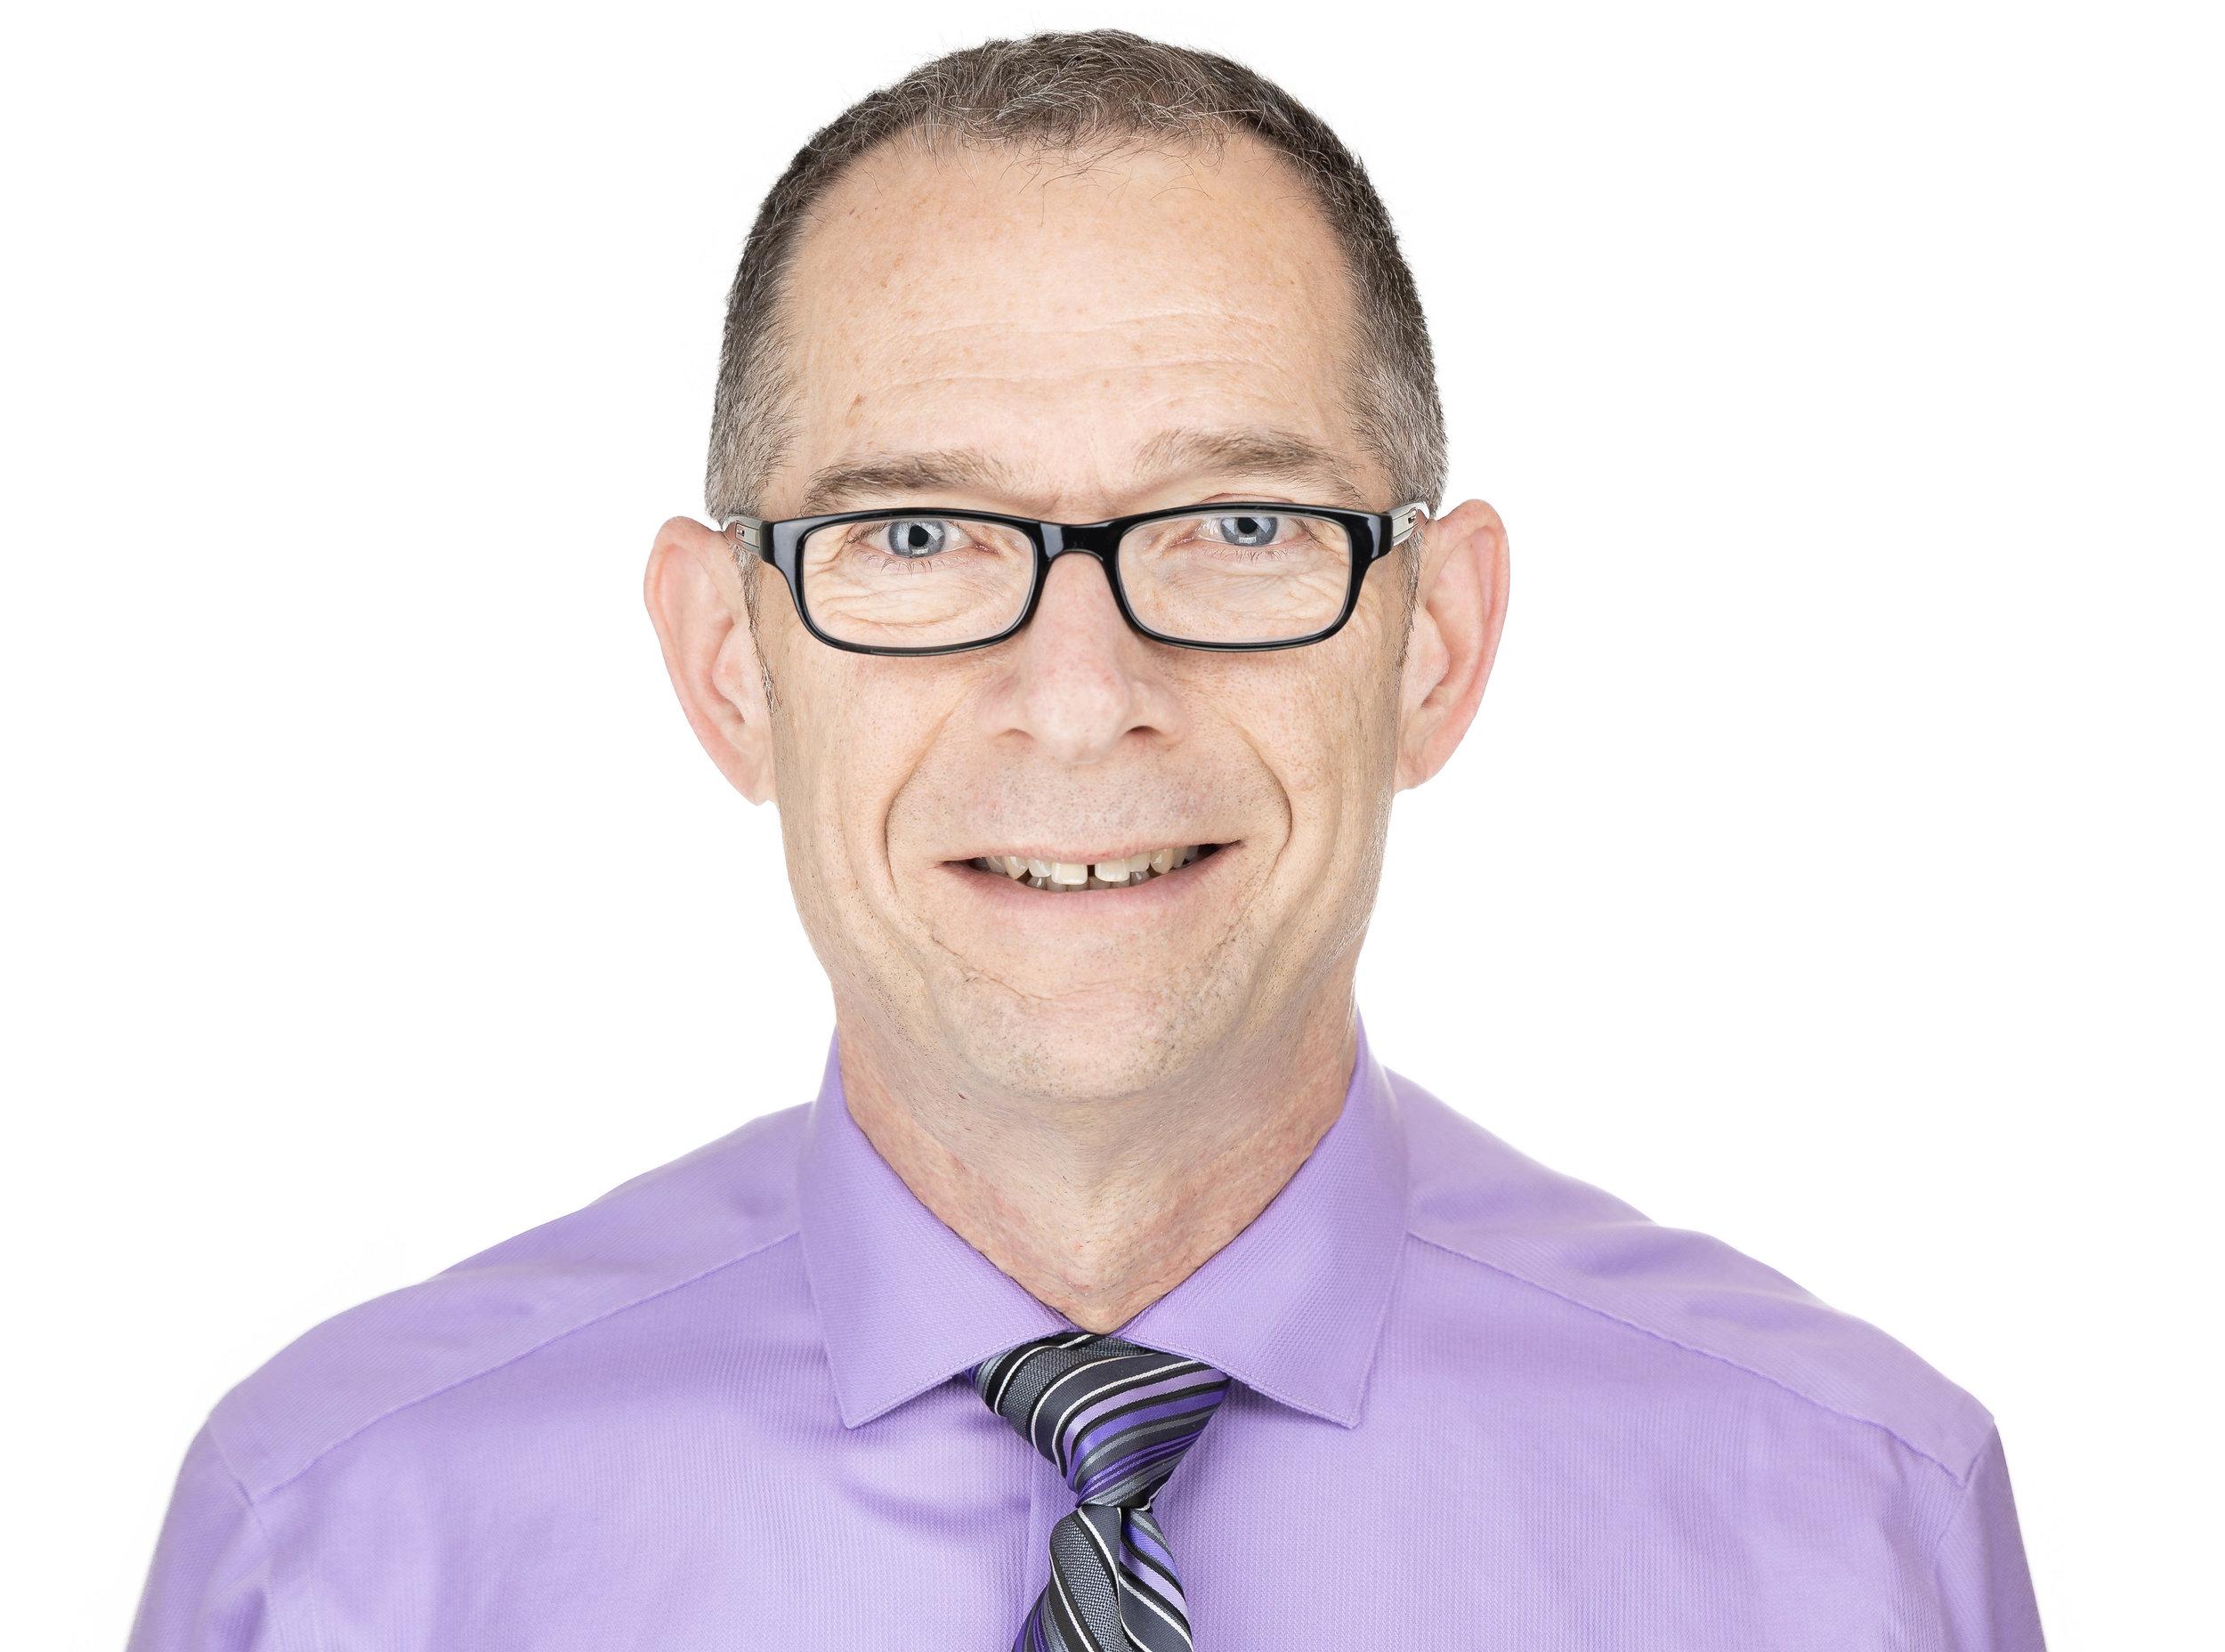 Stephen Gorman, Ph.D., CCC-SLP - voice pathologist